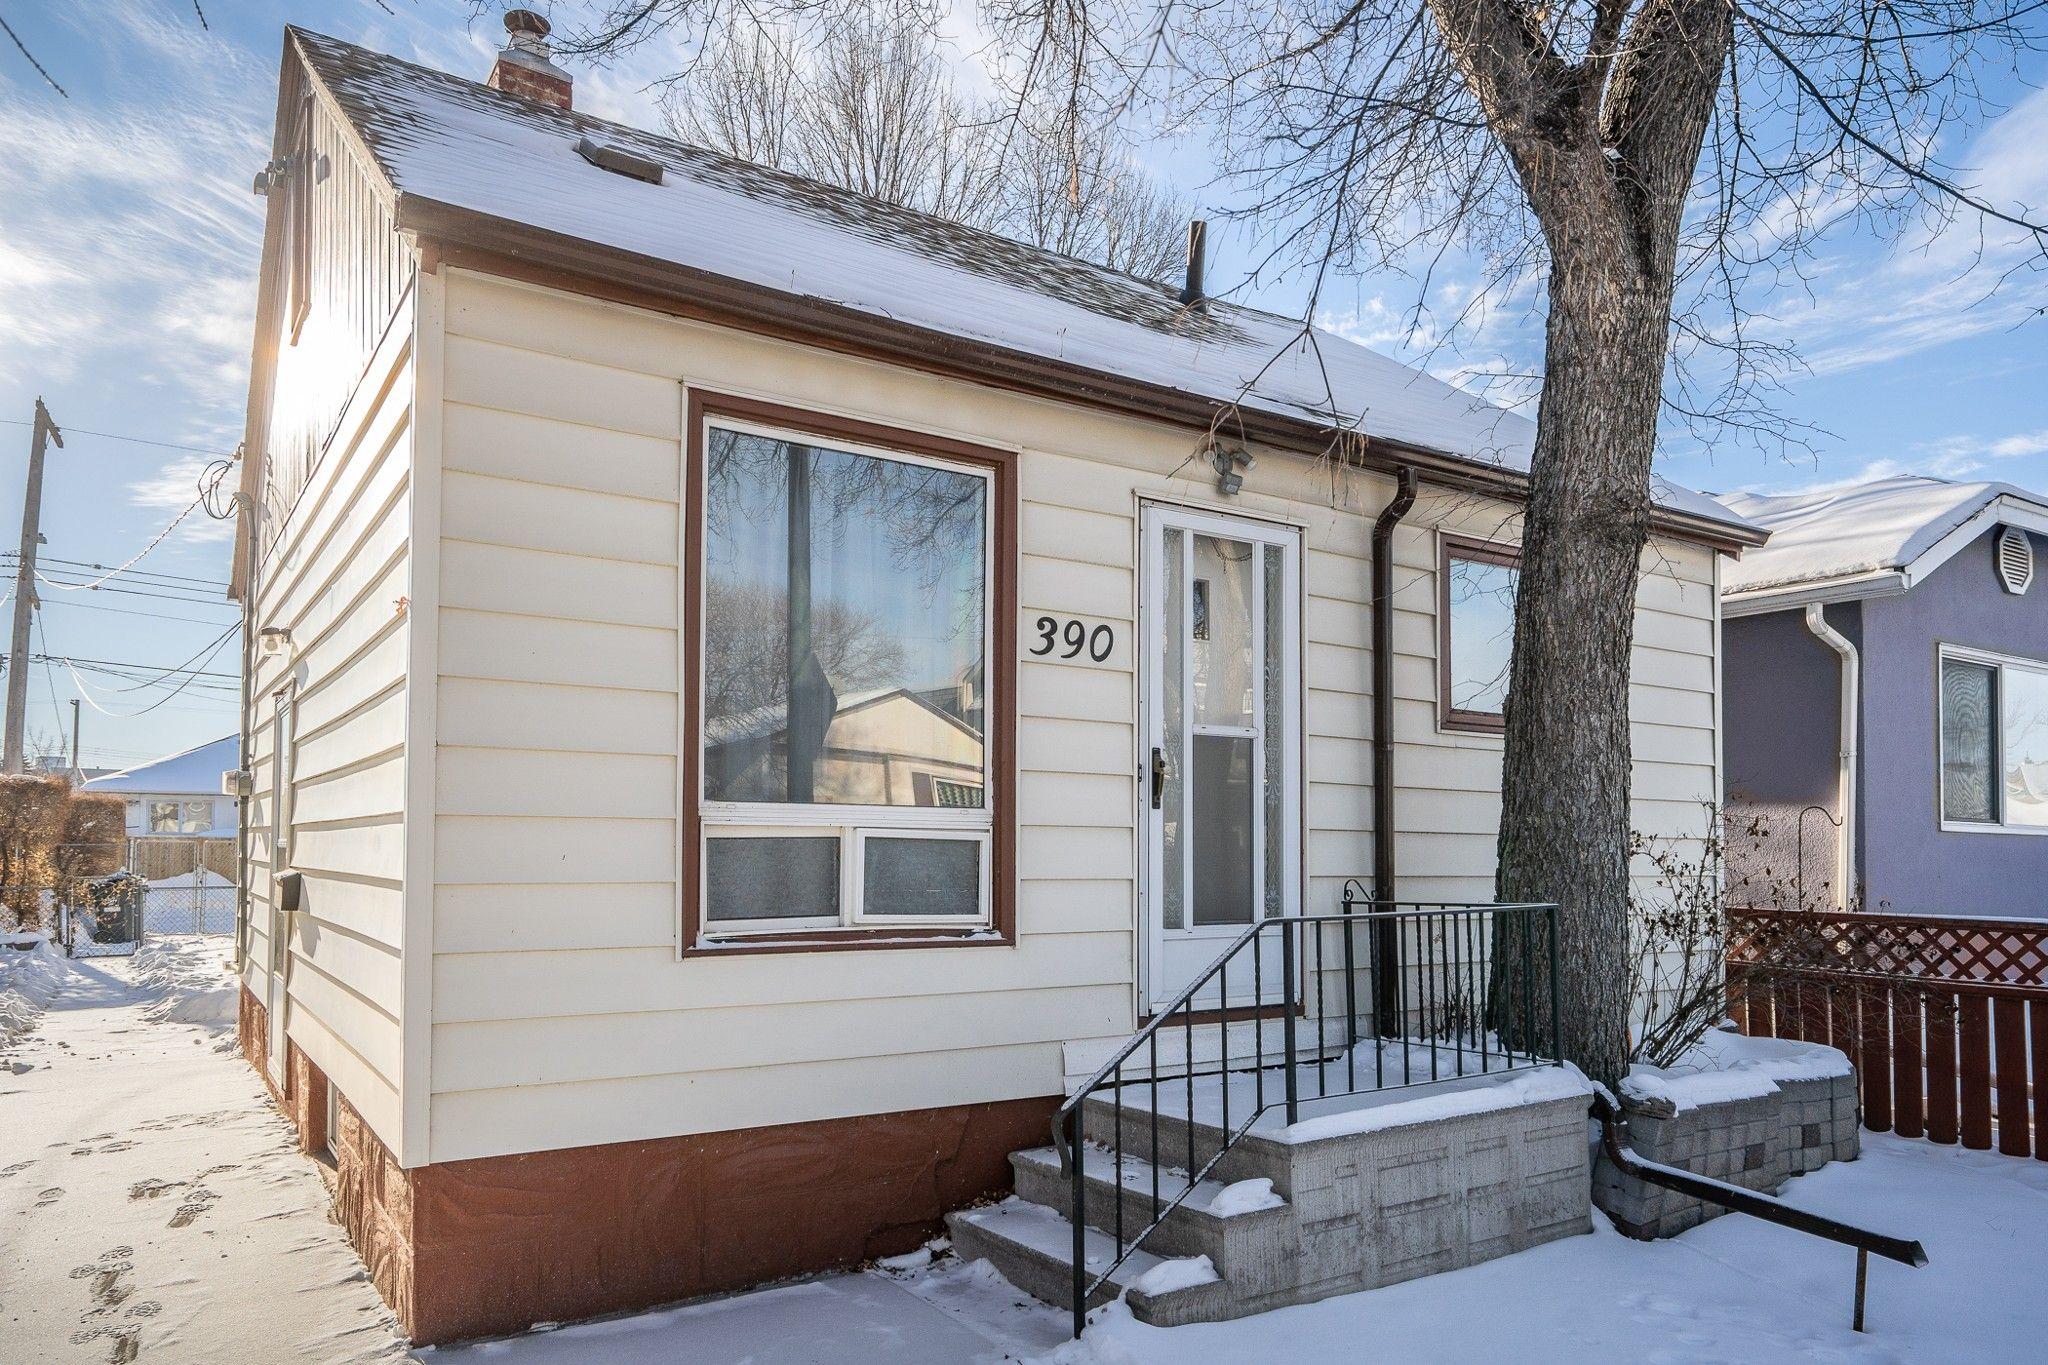 Main Photo: 390 West Union Avenue in Winnipeg: Elmwood House for sale (3A)  : MLS®# 202101238